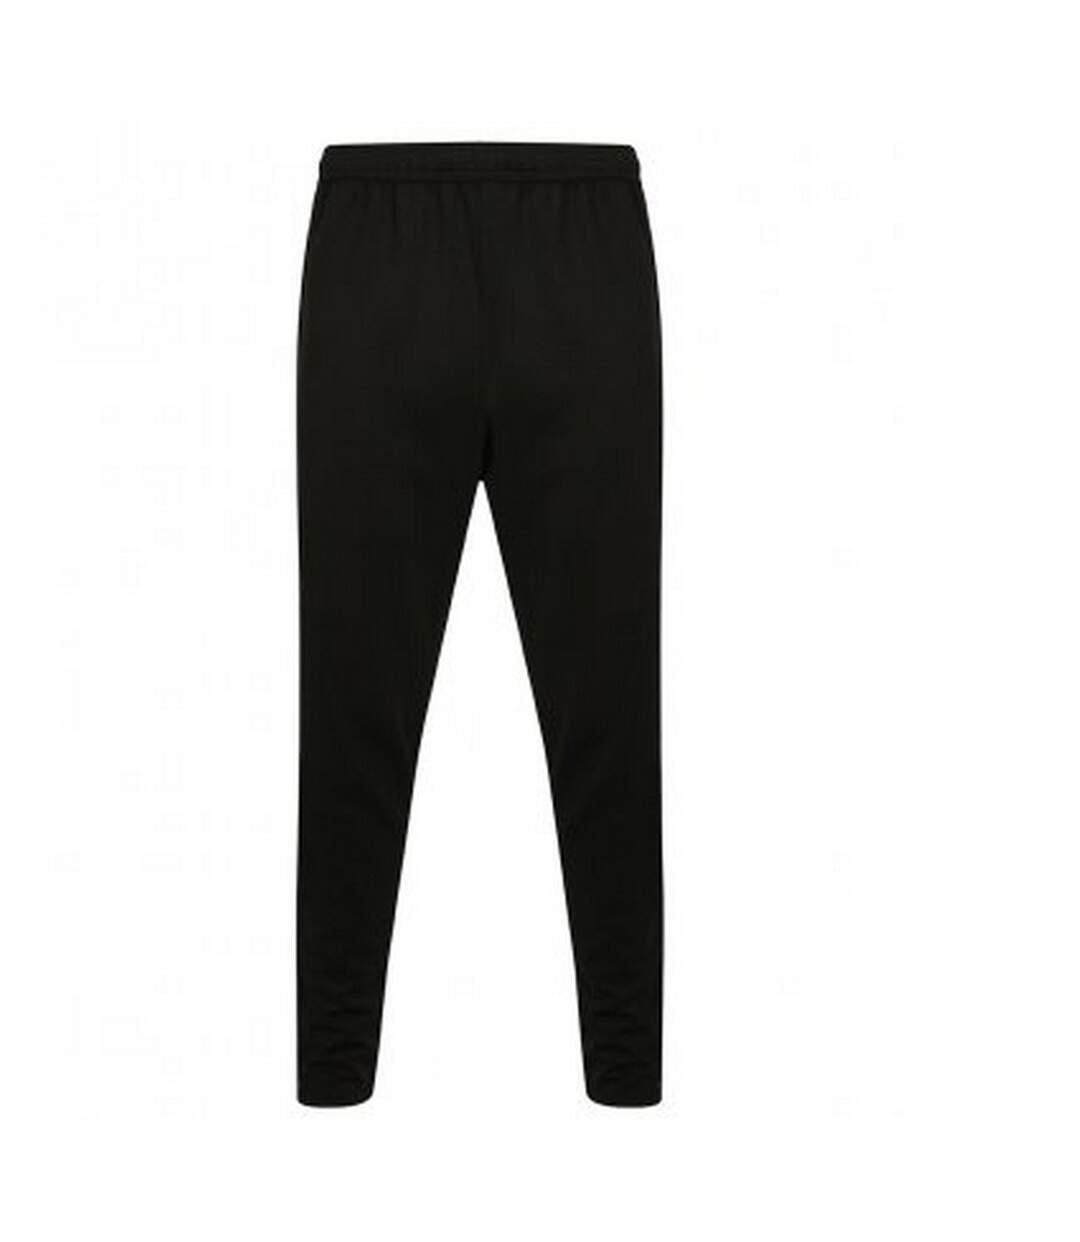 Finden and Hales Mens Knitted Tracksuit Pants (Black/Gunmetal Grey) - UTPC3353